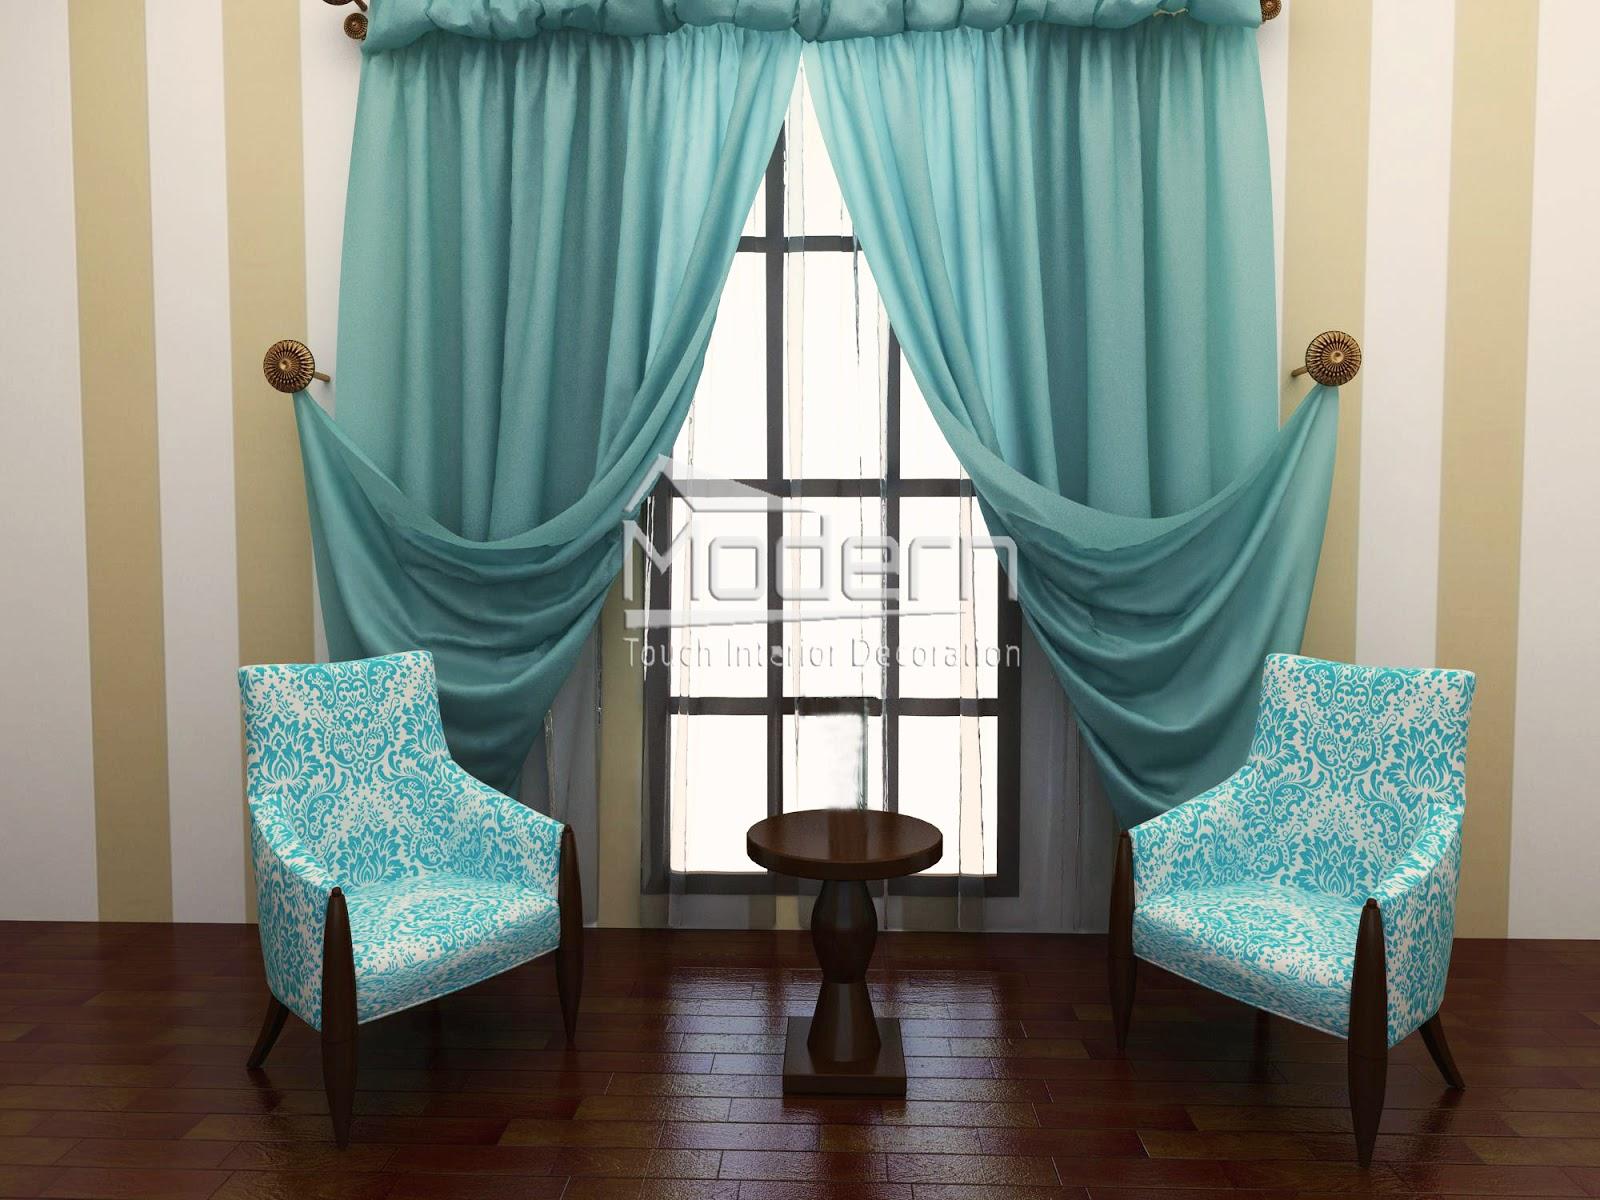 modern touch interior decoration. Black Bedroom Furniture Sets. Home Design Ideas